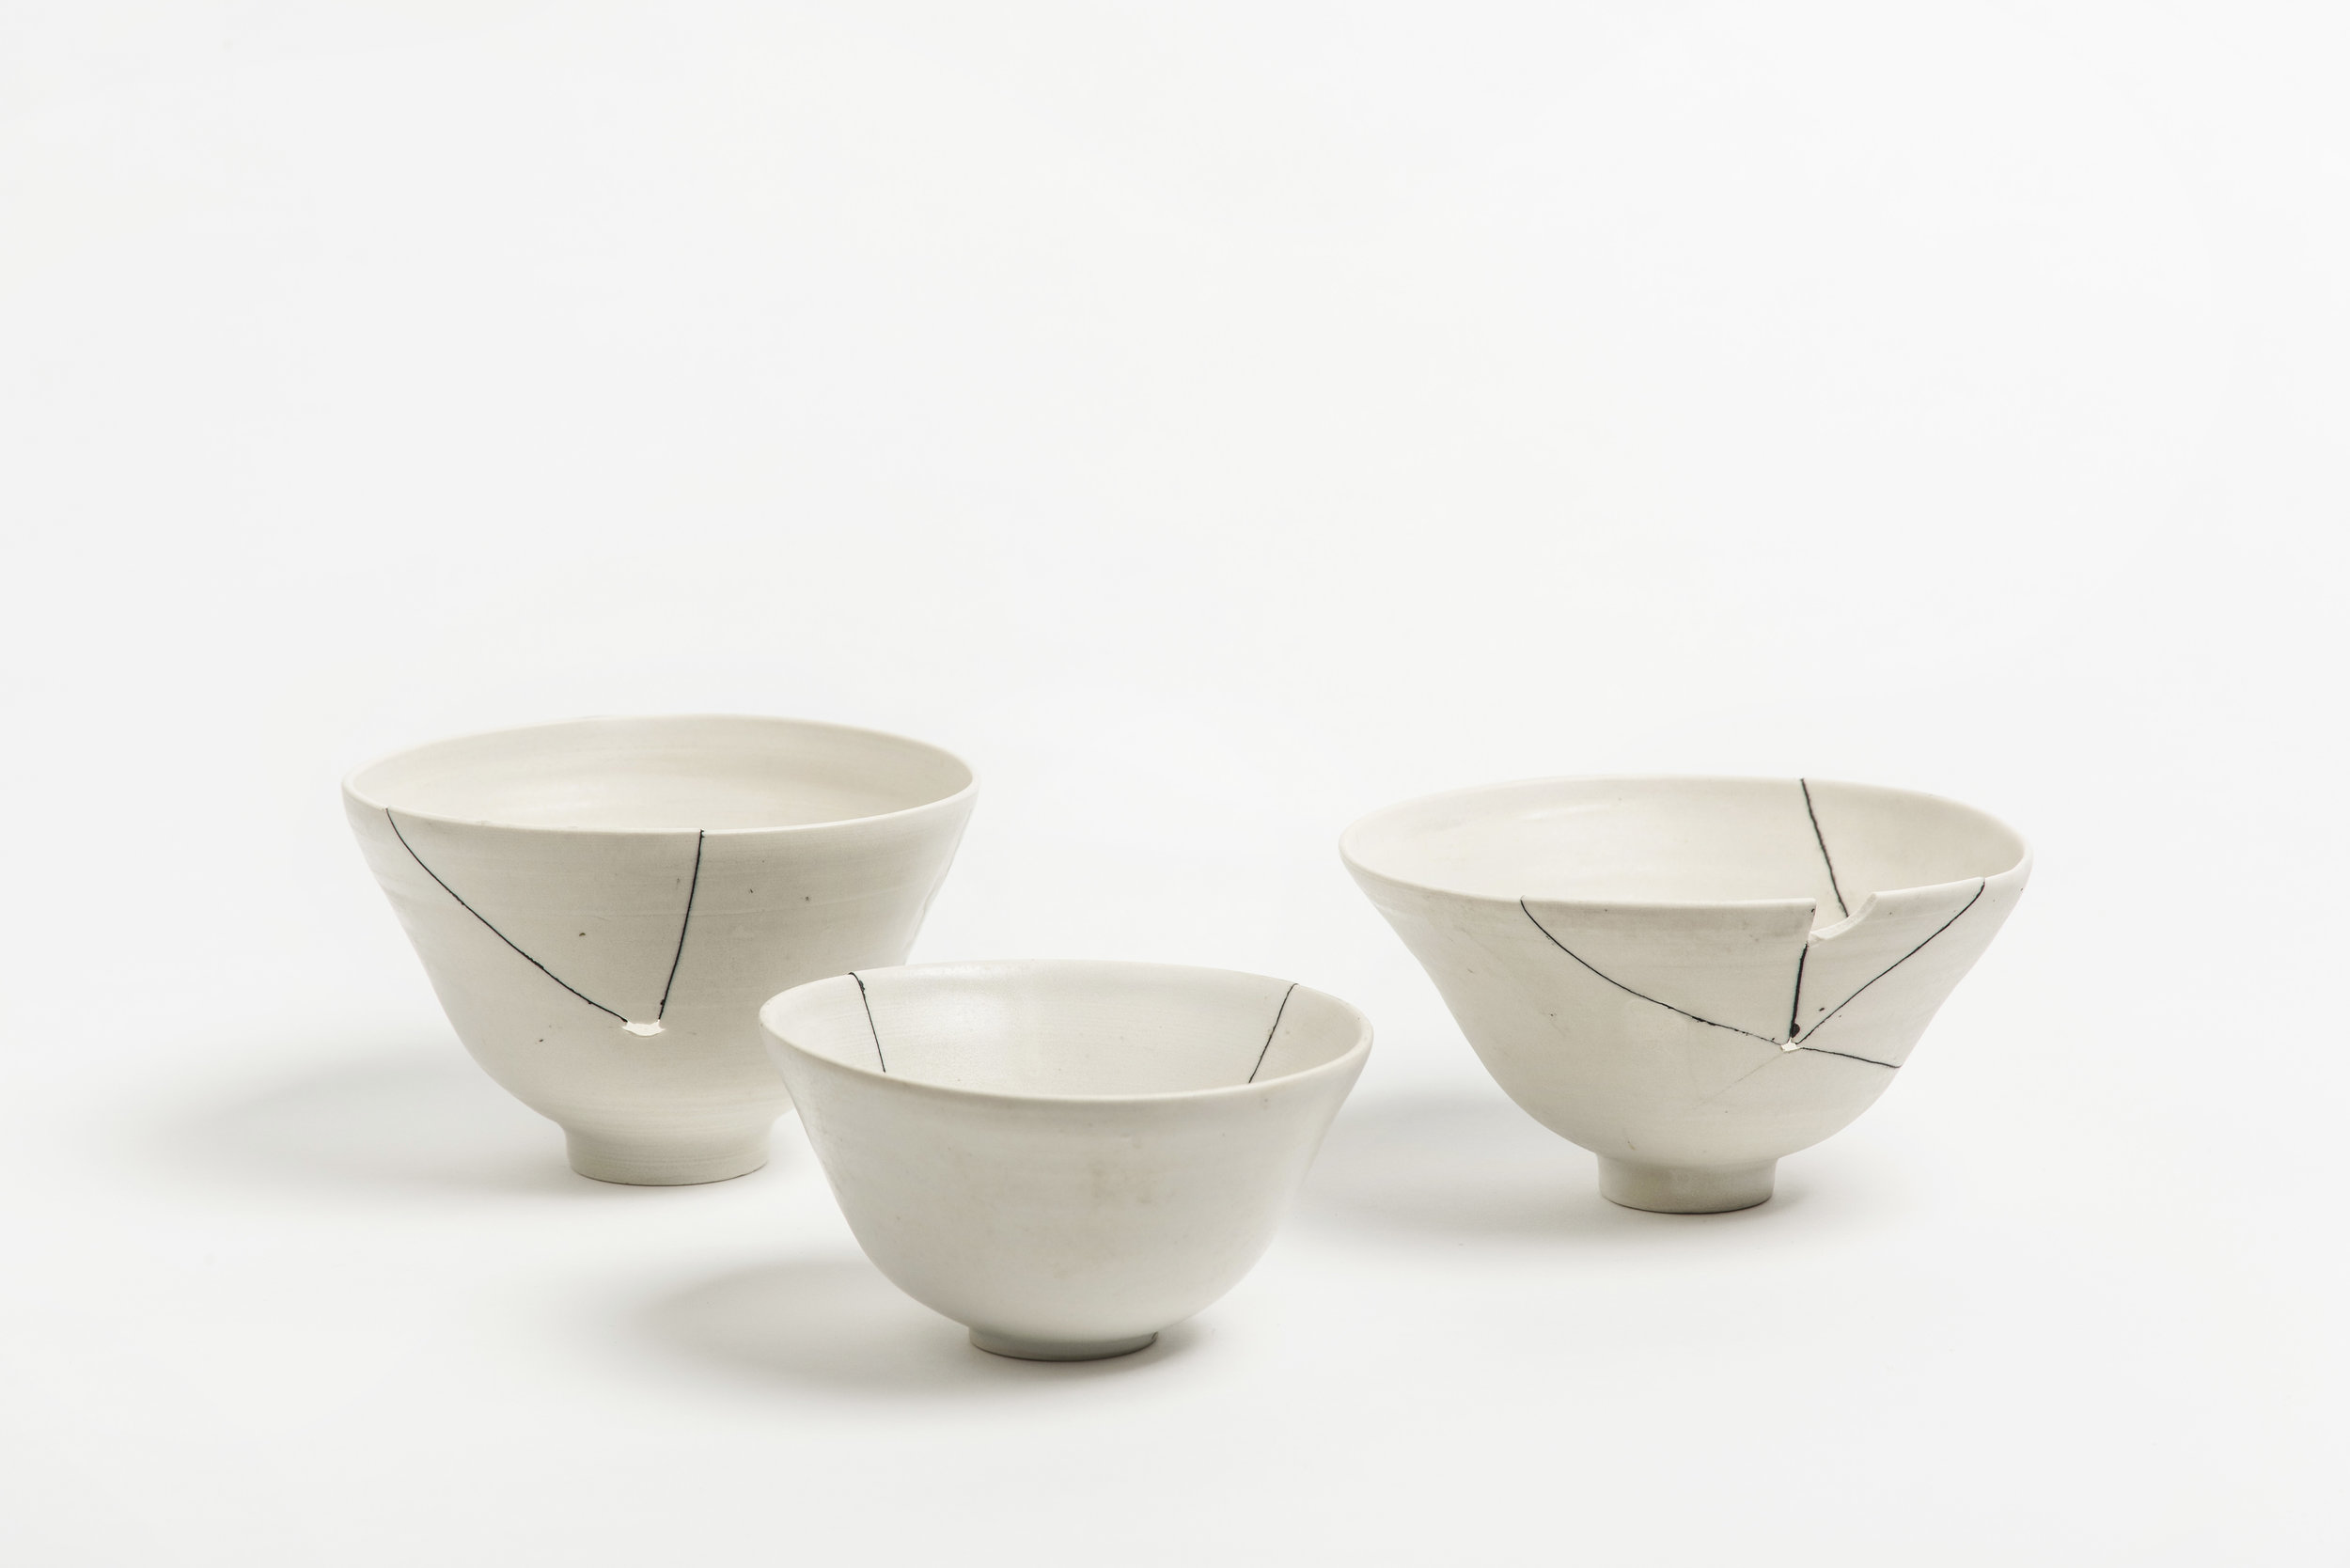 fractures-series-bowl-romy-northover-ceramics-the-garnered-80.jpg